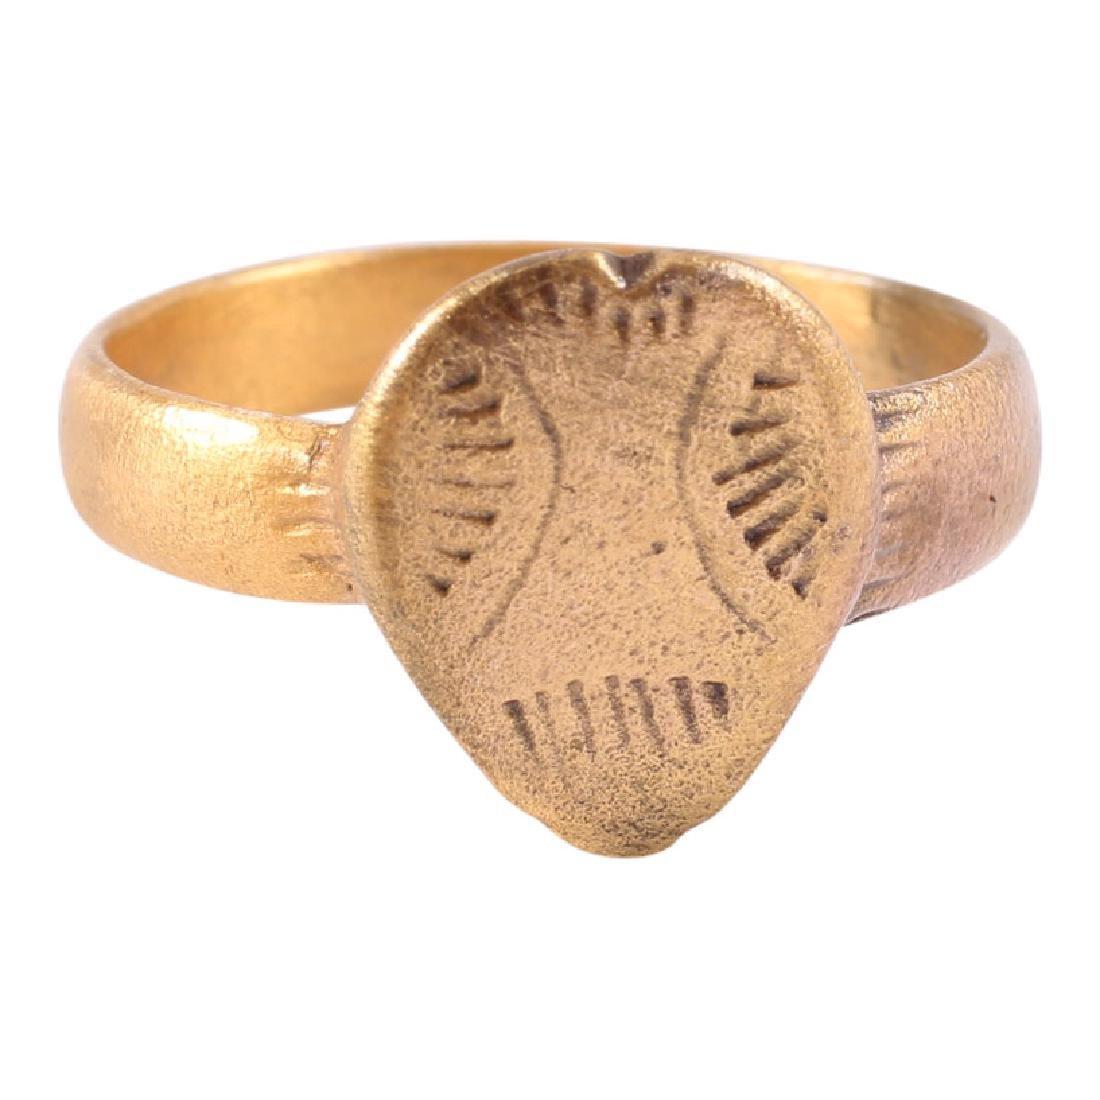 Viking Warrior's Heart Ring, 850-1000